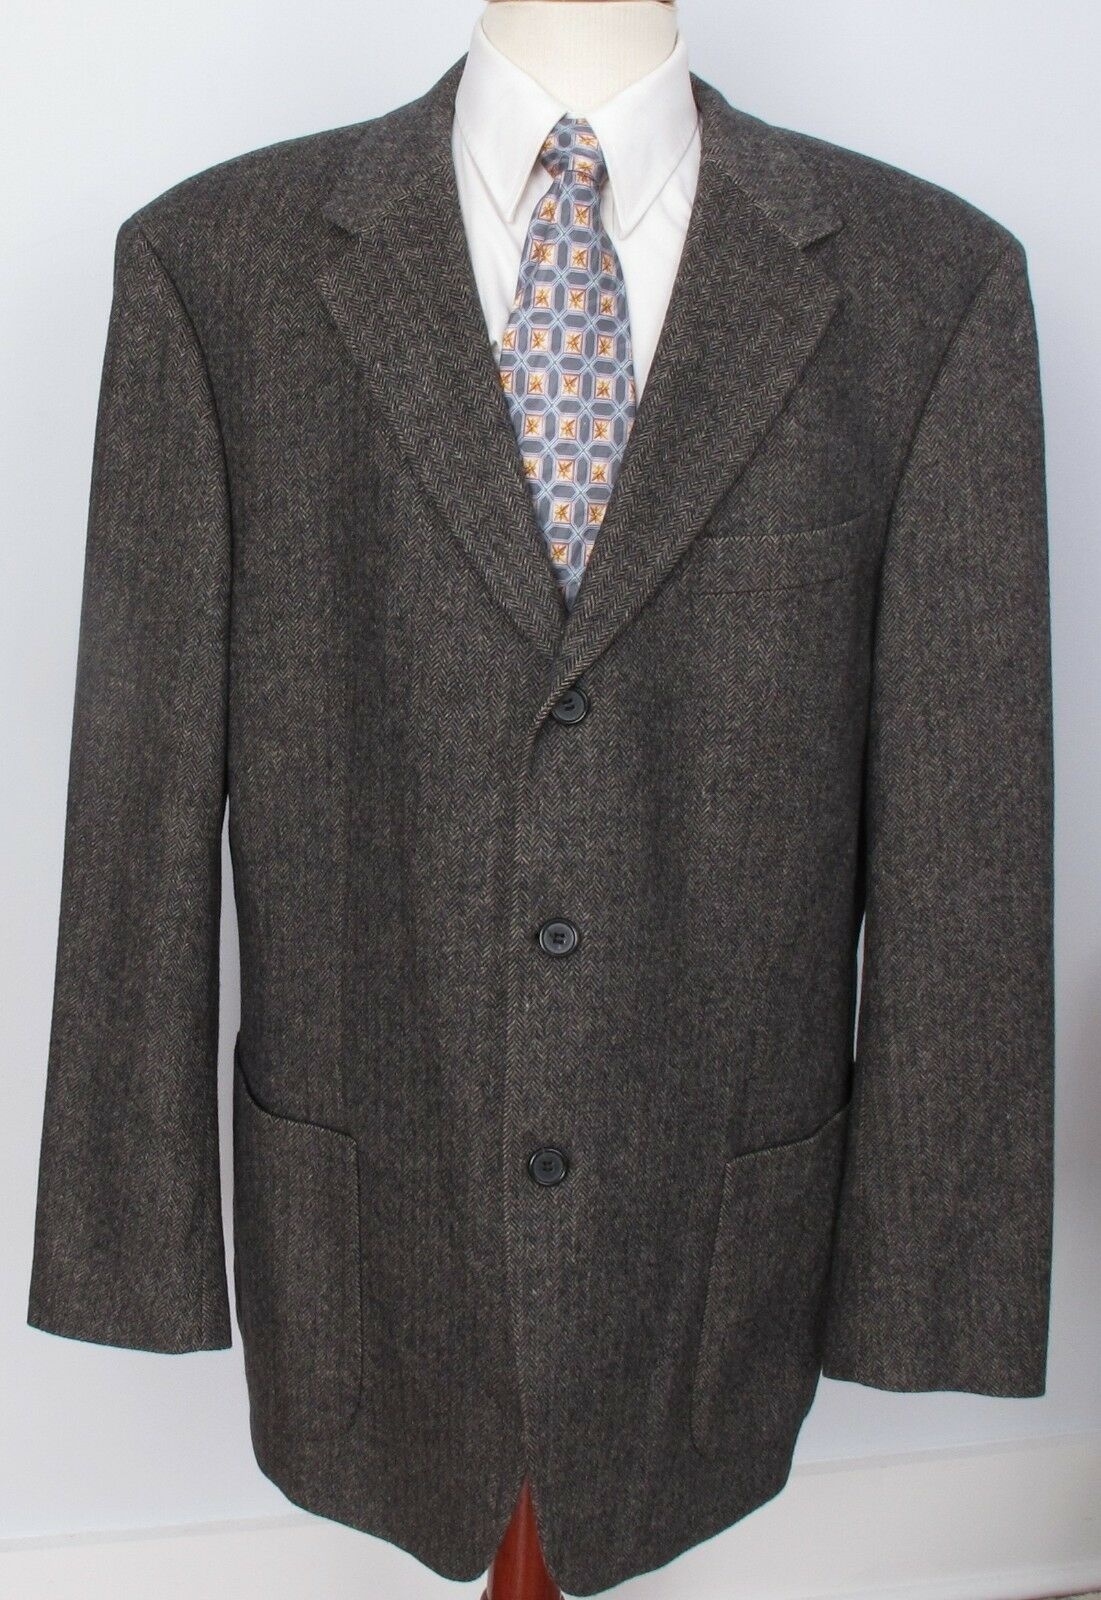 Hugo Boss Tweed Sport Coat grau Braun 44R Edison 3 Button Wool Blend